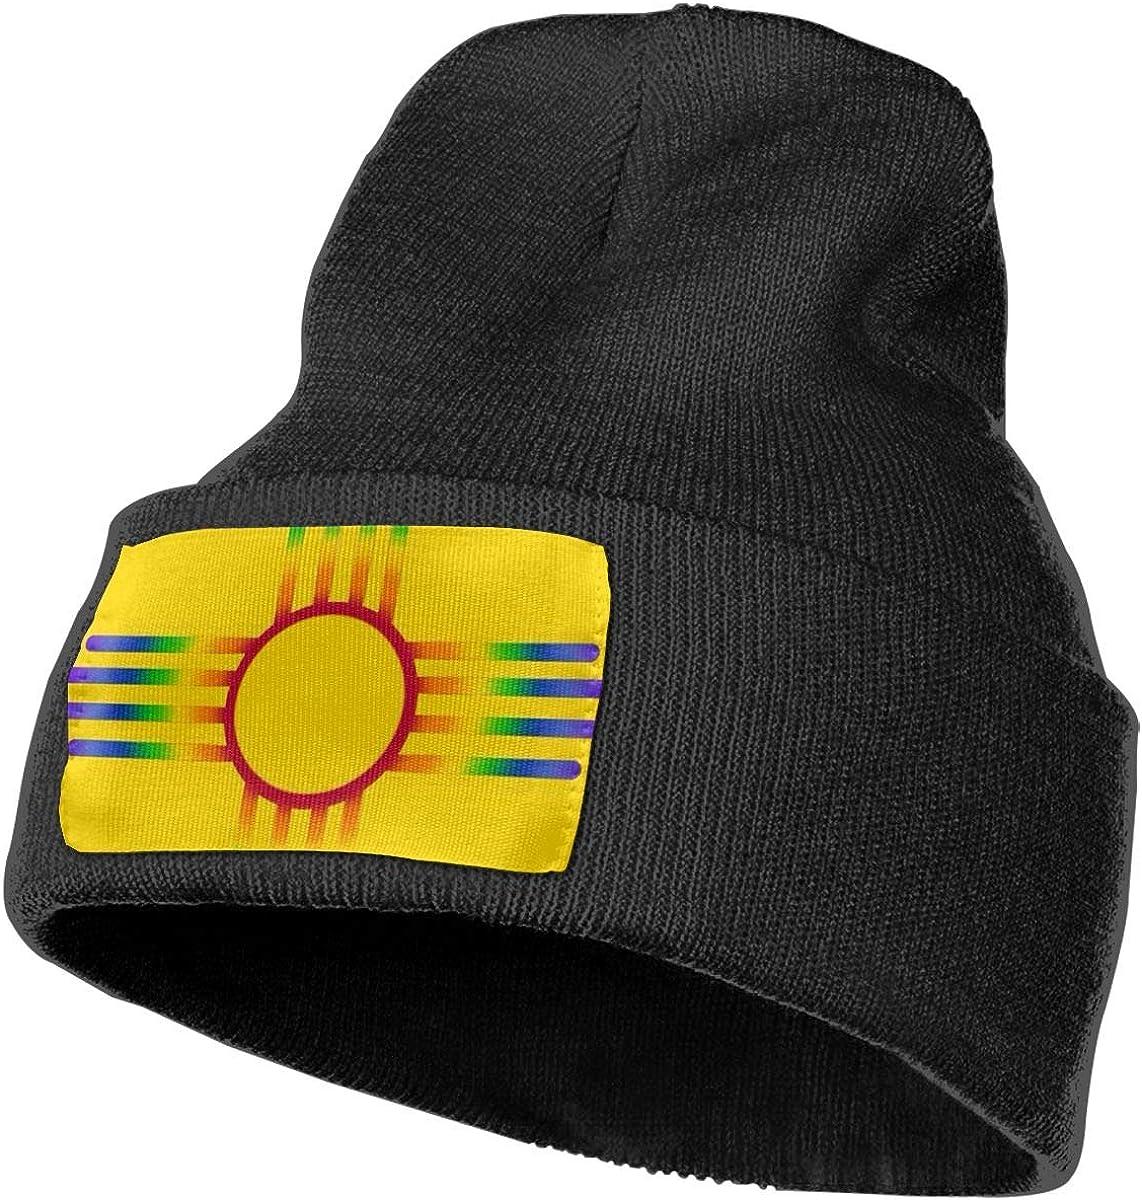 Ruin New Mexico State Flag Fashion Knitting Hat for Men Women 100/% Acrylic Acid Mas Beanie Hat